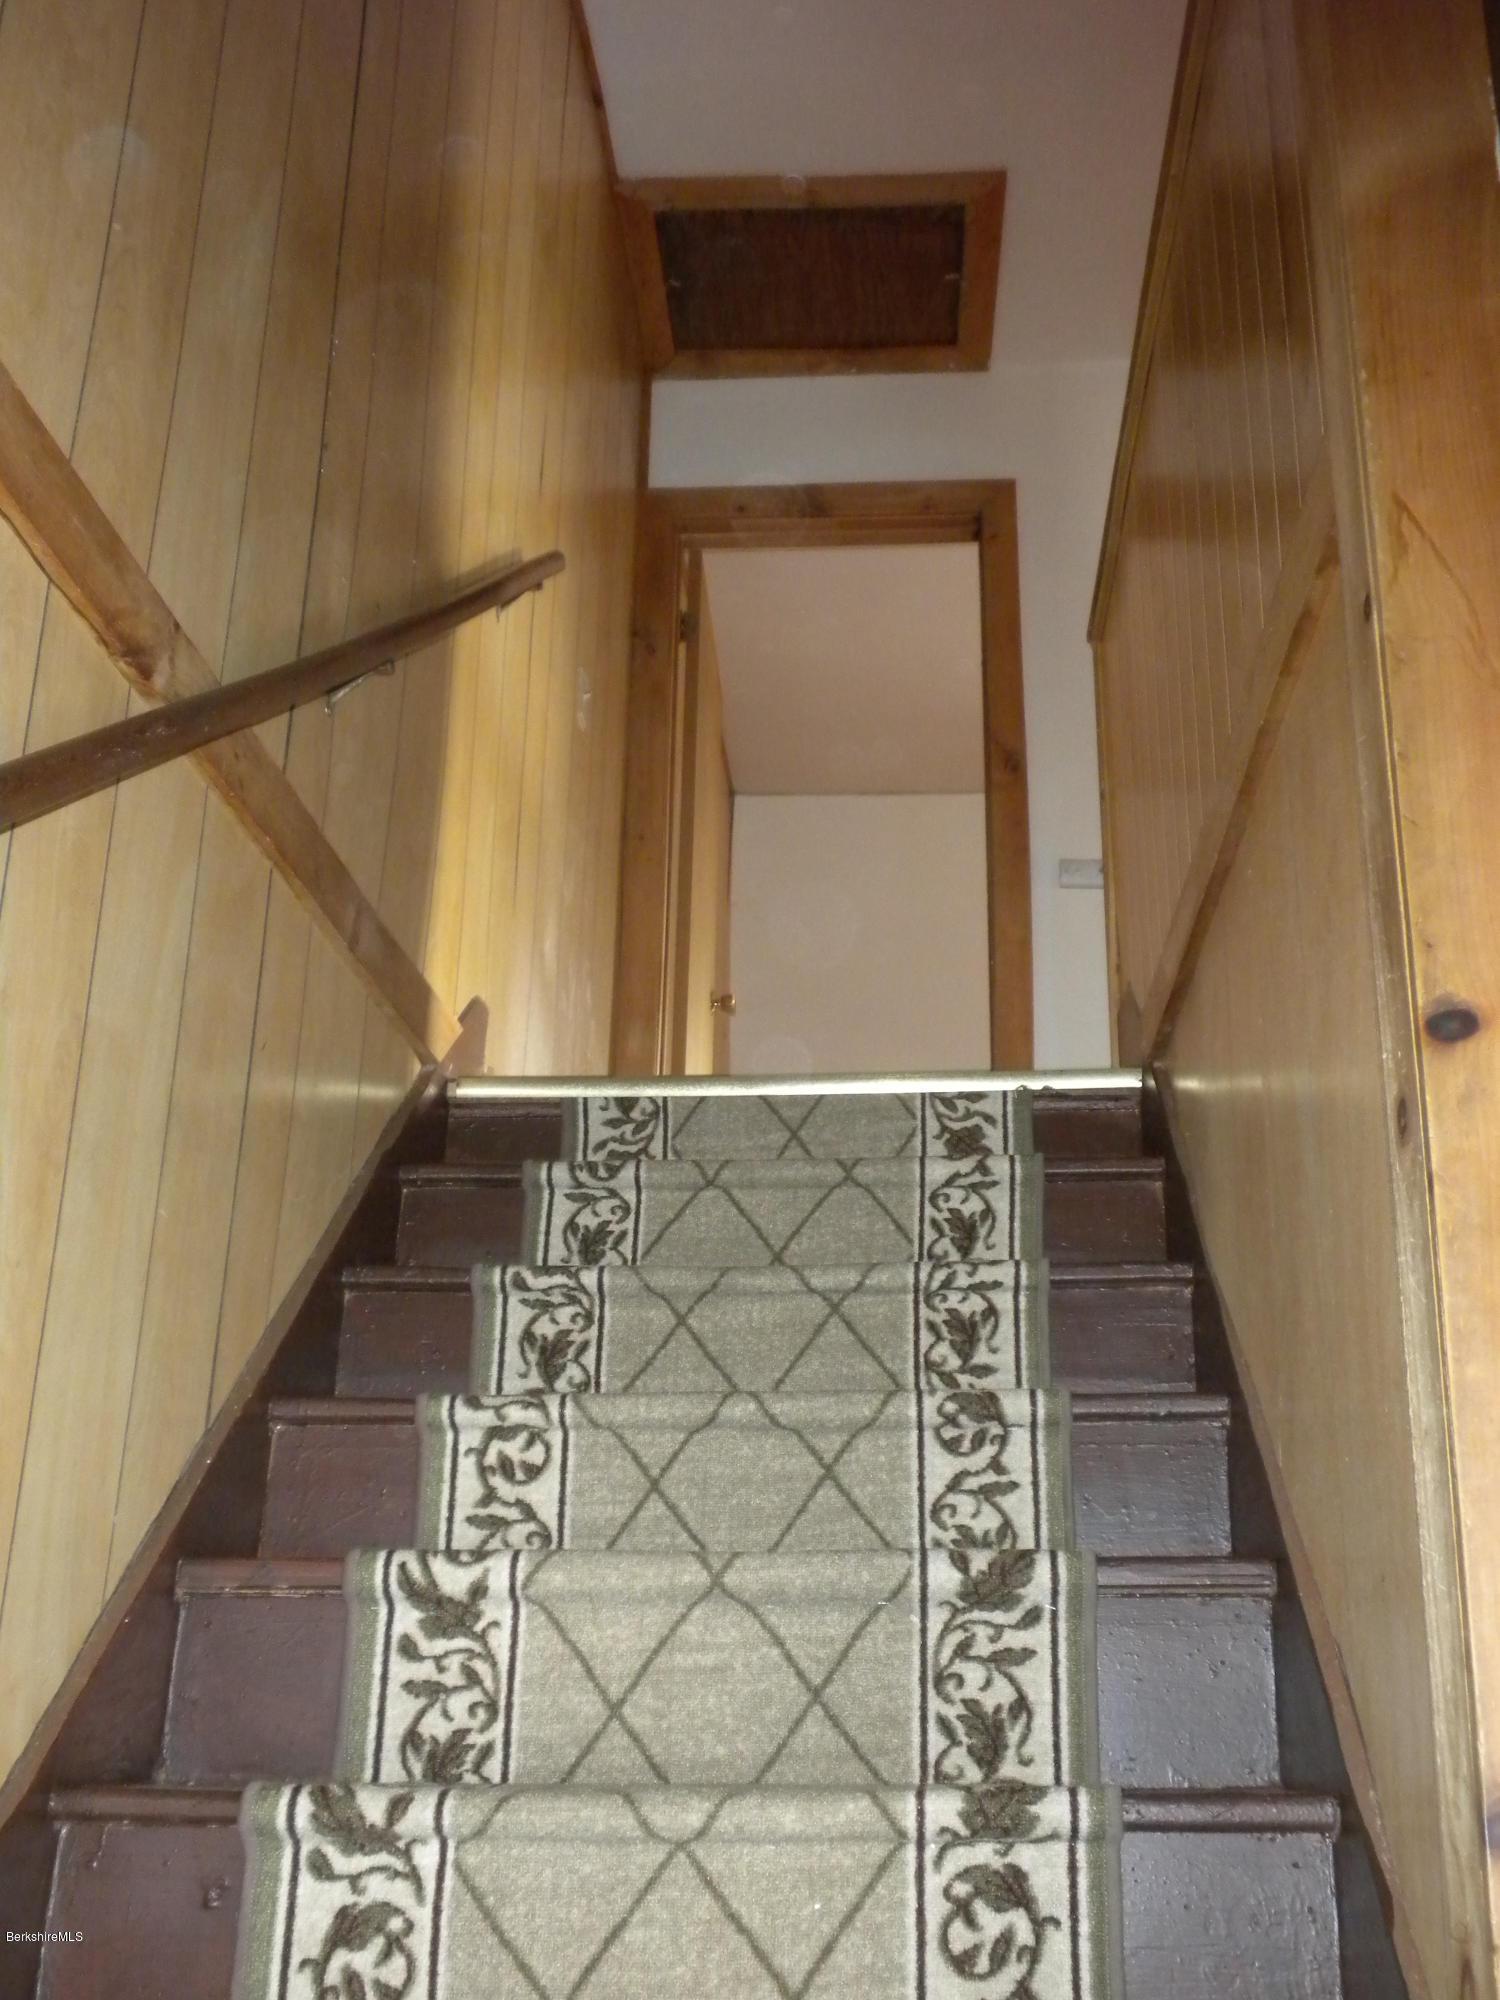 4. Stairway